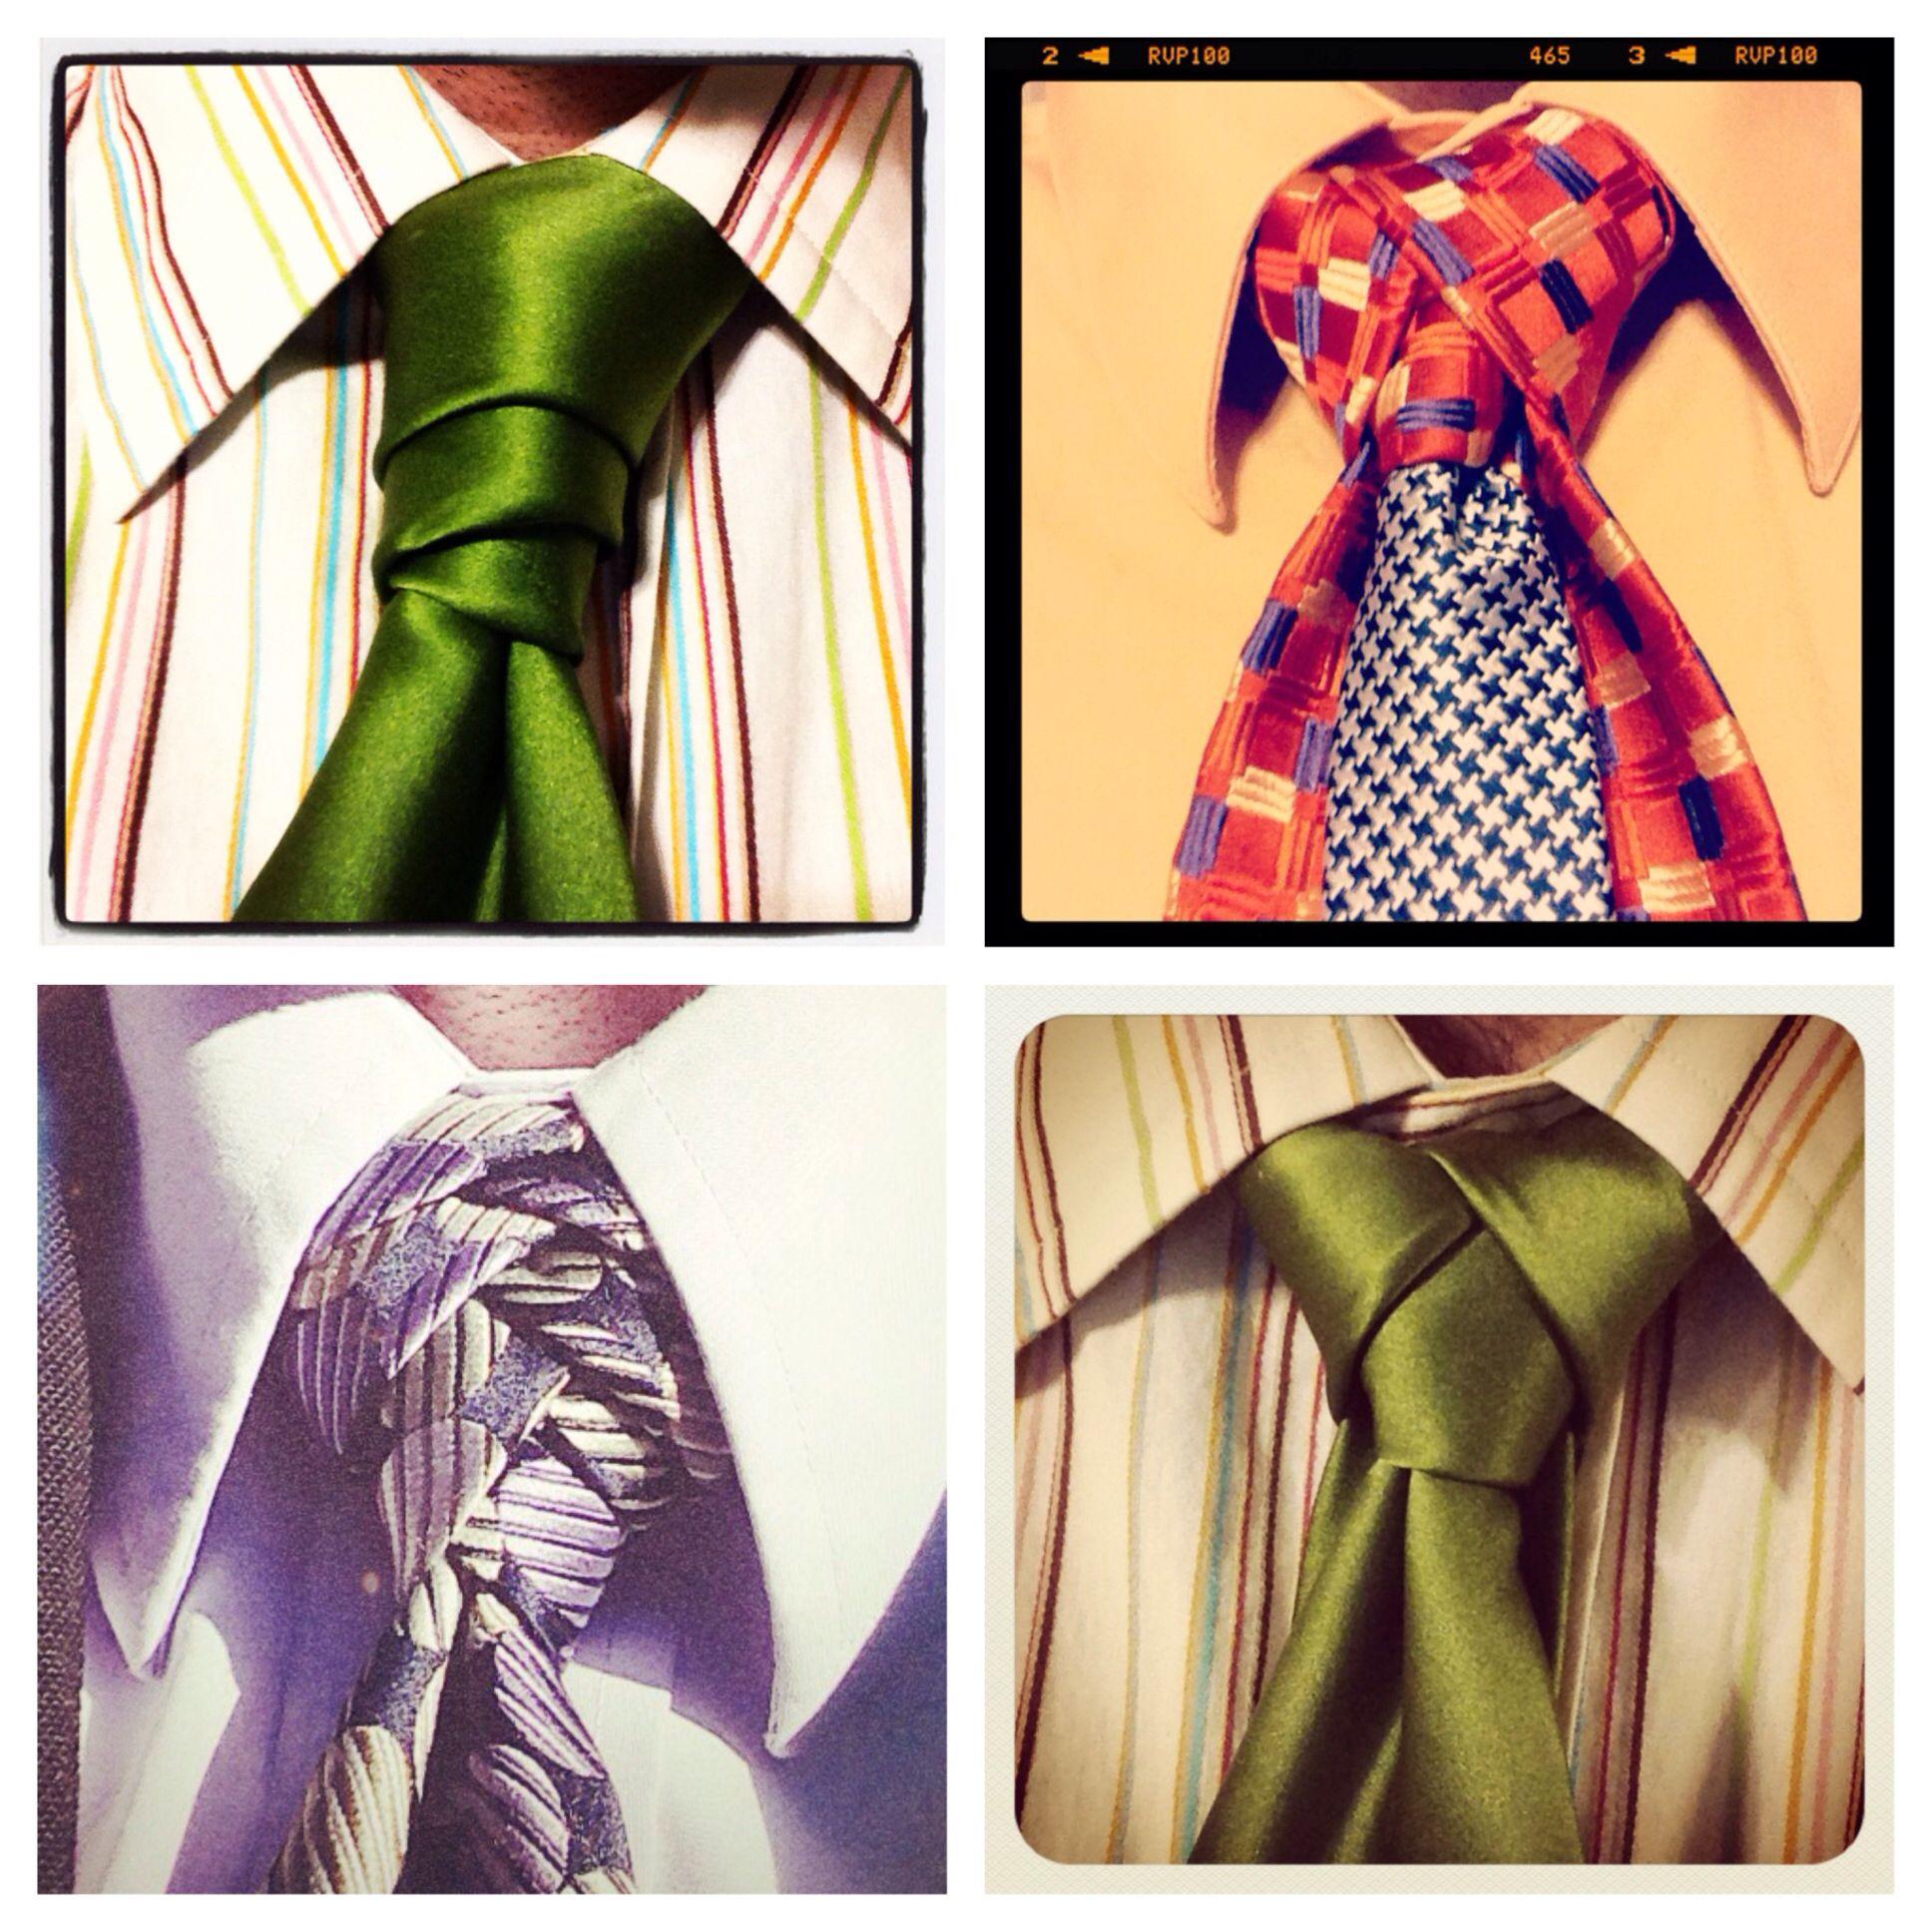 Cape Knot Diagram How To Tie A Trinity Van Wijk Necktie Awesome Knots And Elderedge 1936x1936